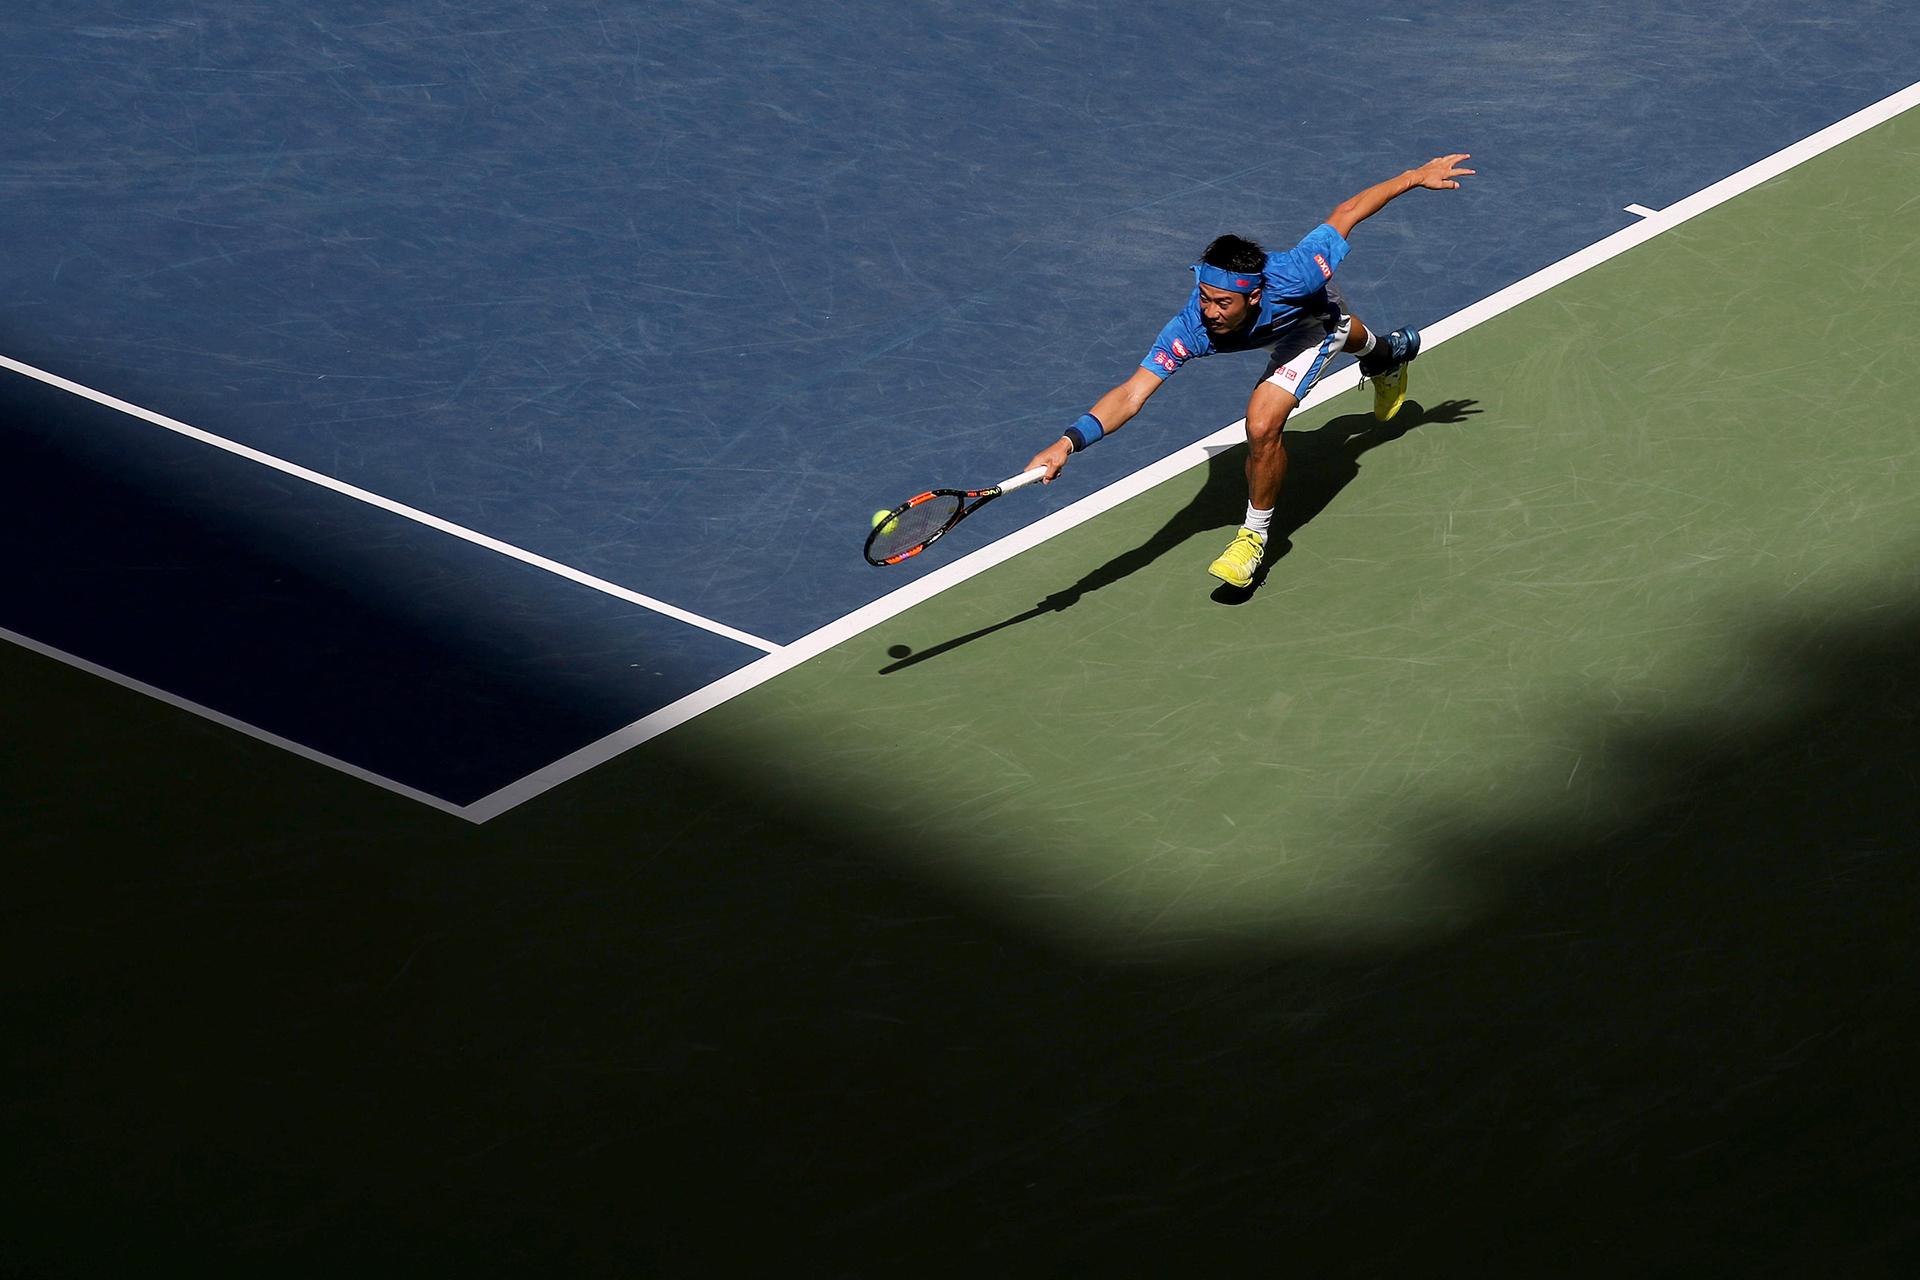 070916_Tennis_USOpen_0998